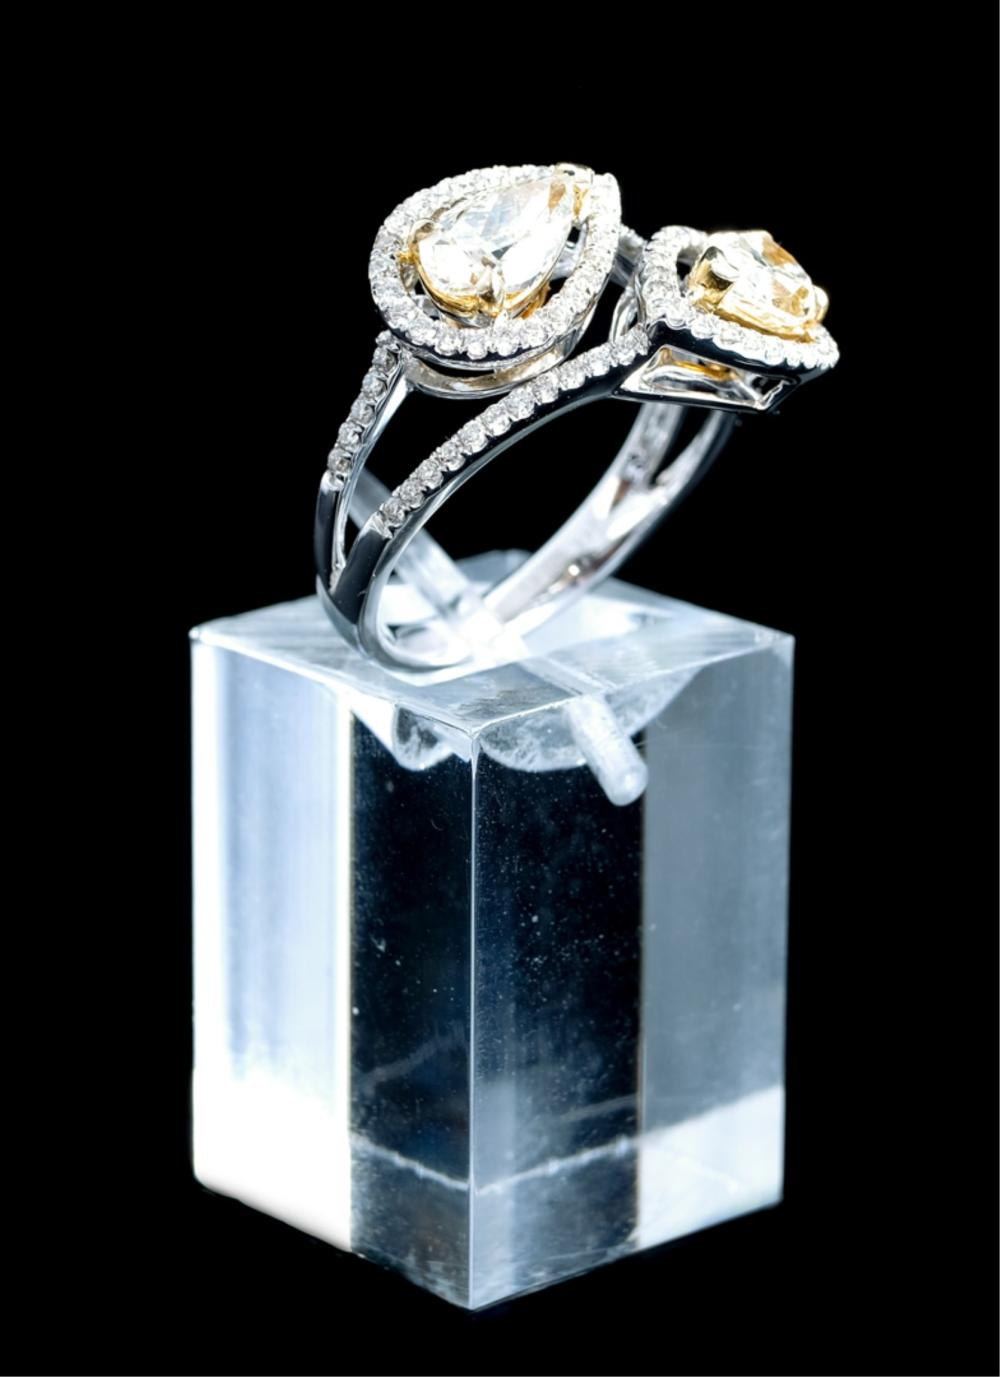 14k White & Yellow Gold Pear Shaped Diamond Ring